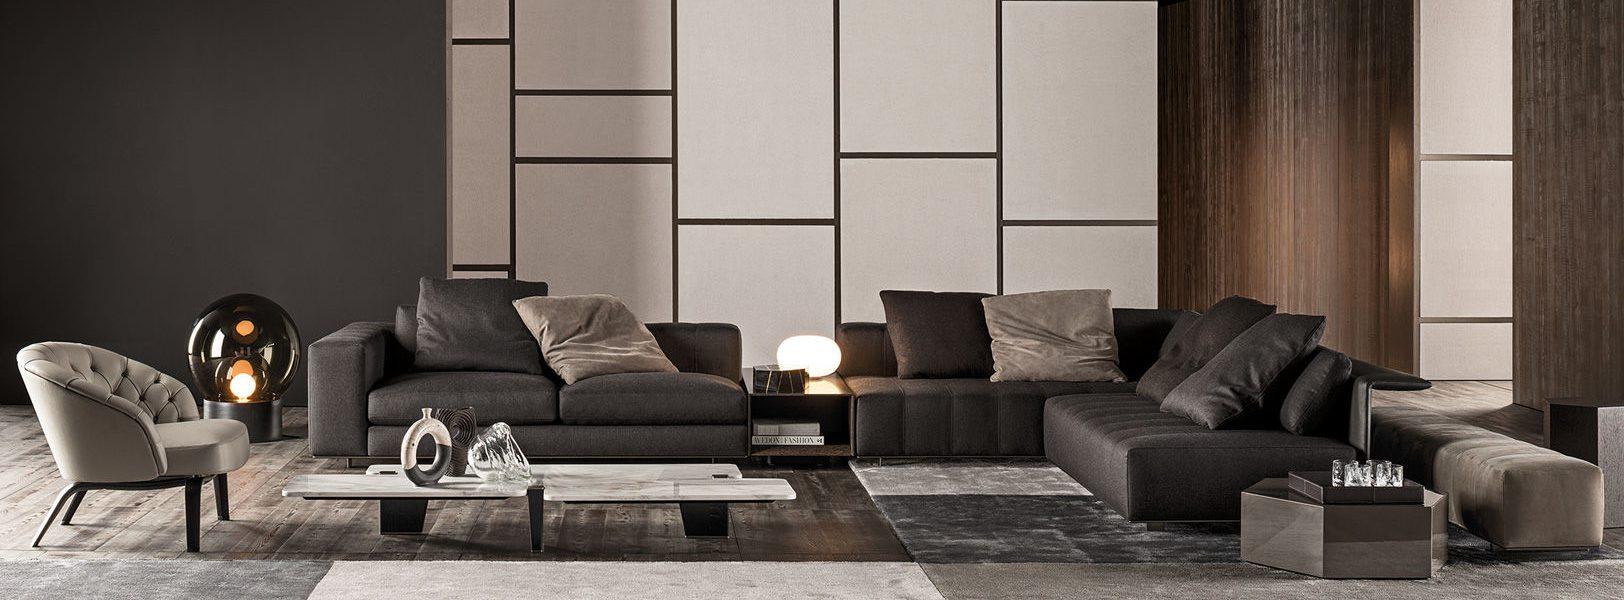 Freeman Sofa